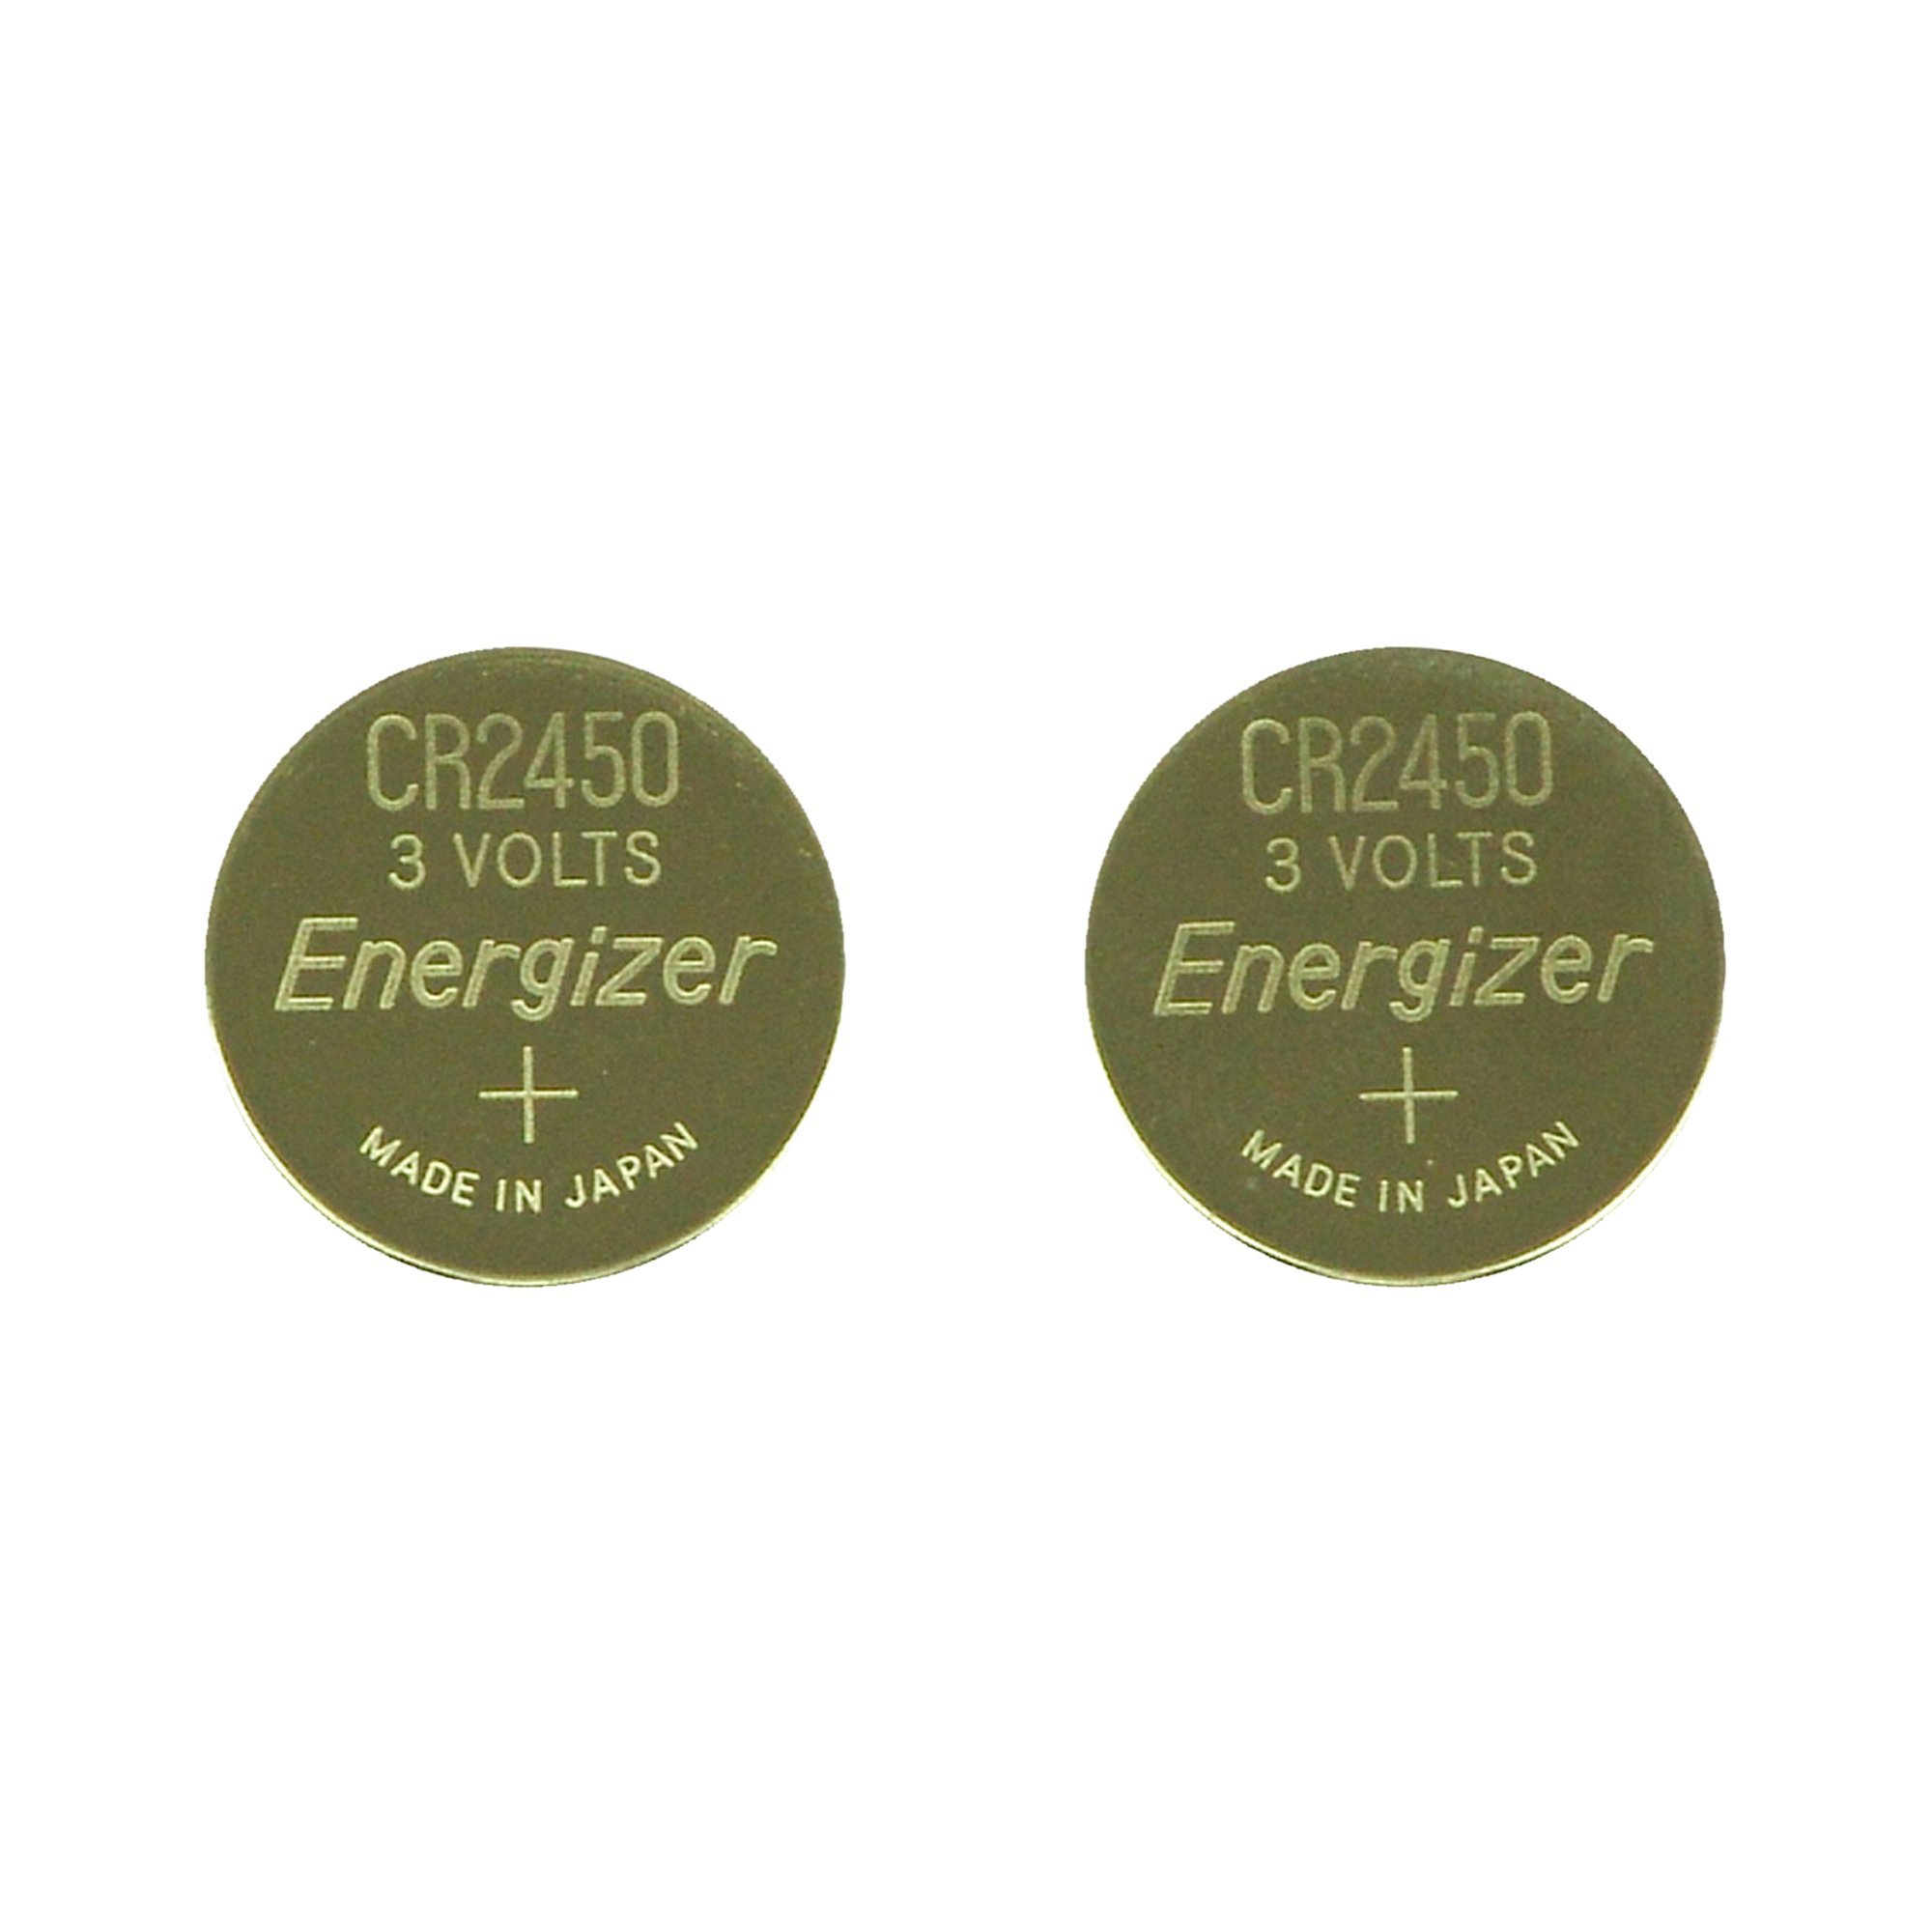 Jackson Safety NexGen Replacement Batteries (15984), Accessory for NexGen Digital ADF Welding Helmet, 10 Pairs / Order